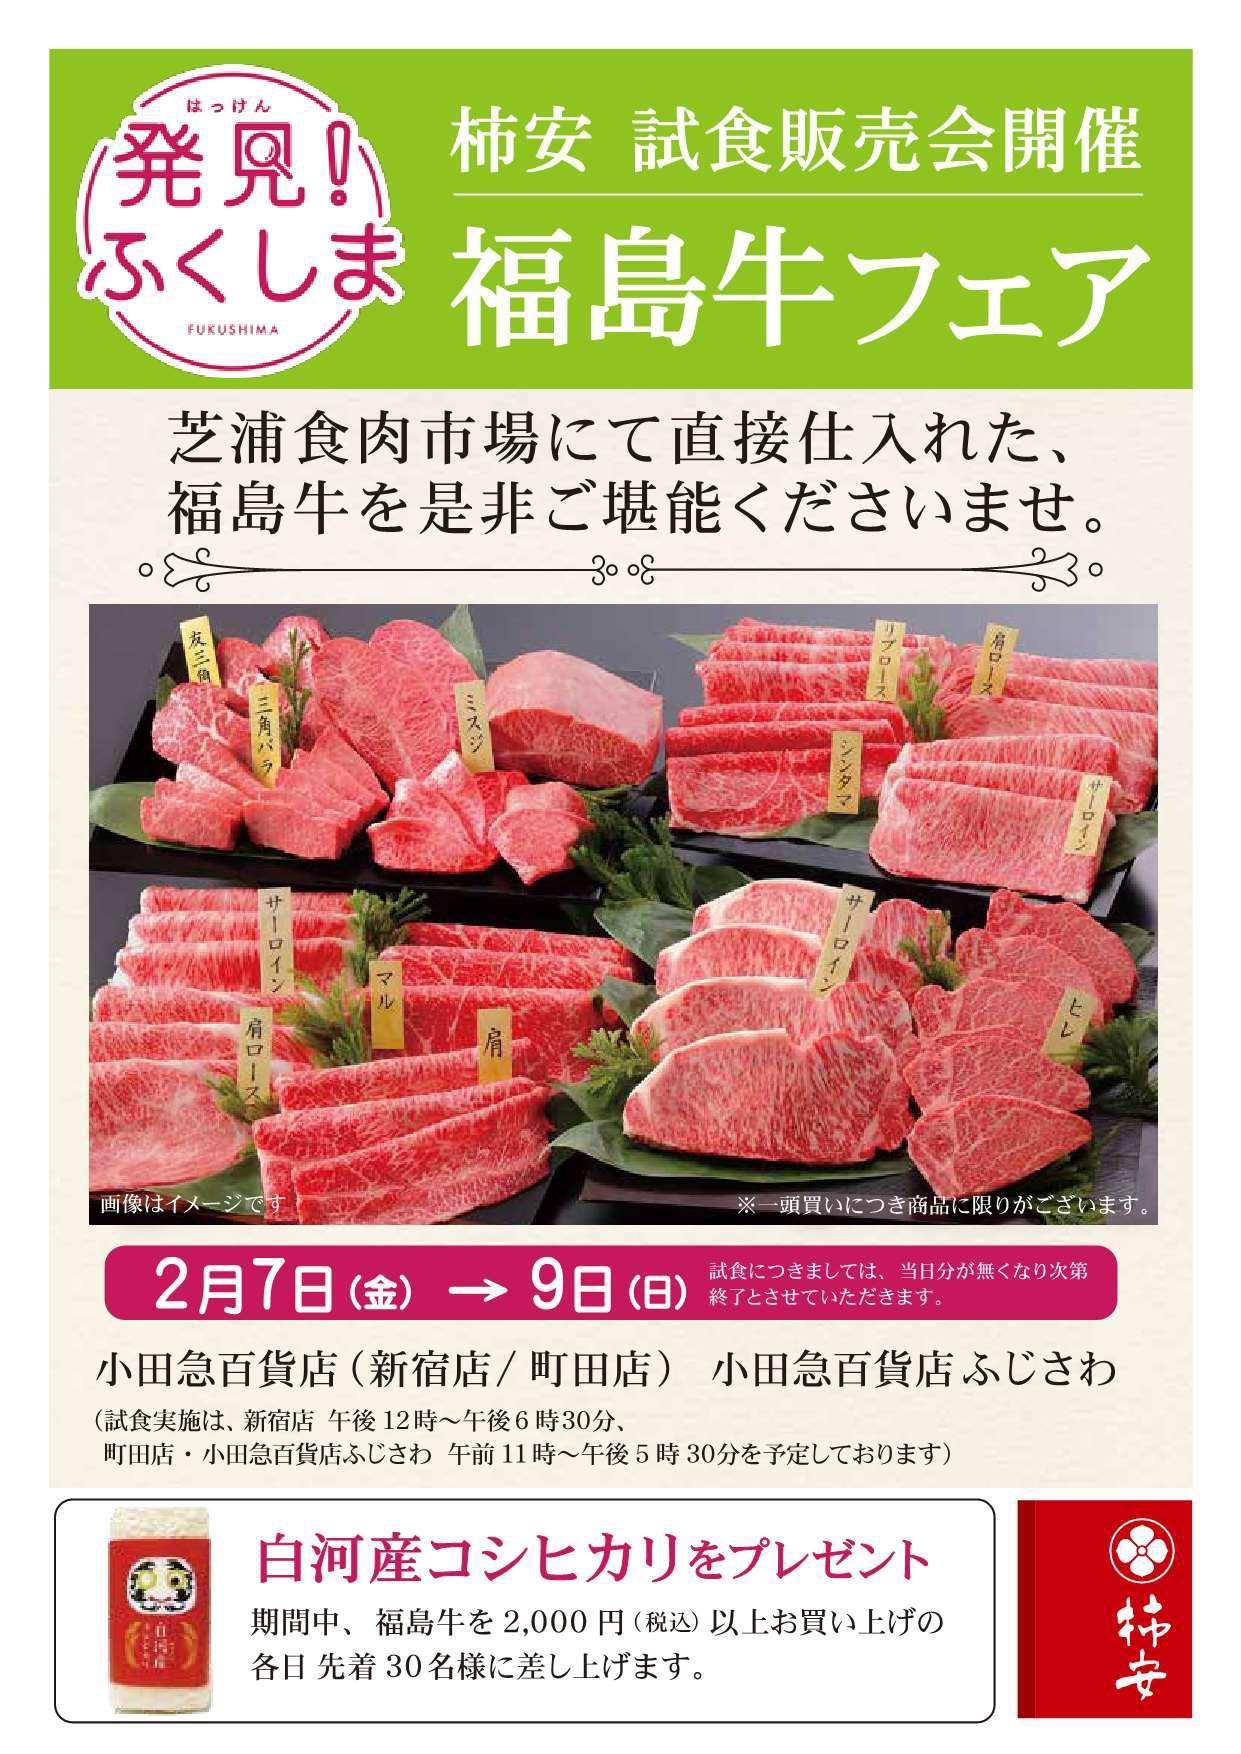 2月 小田急福島牛フェア告知POP.jpg